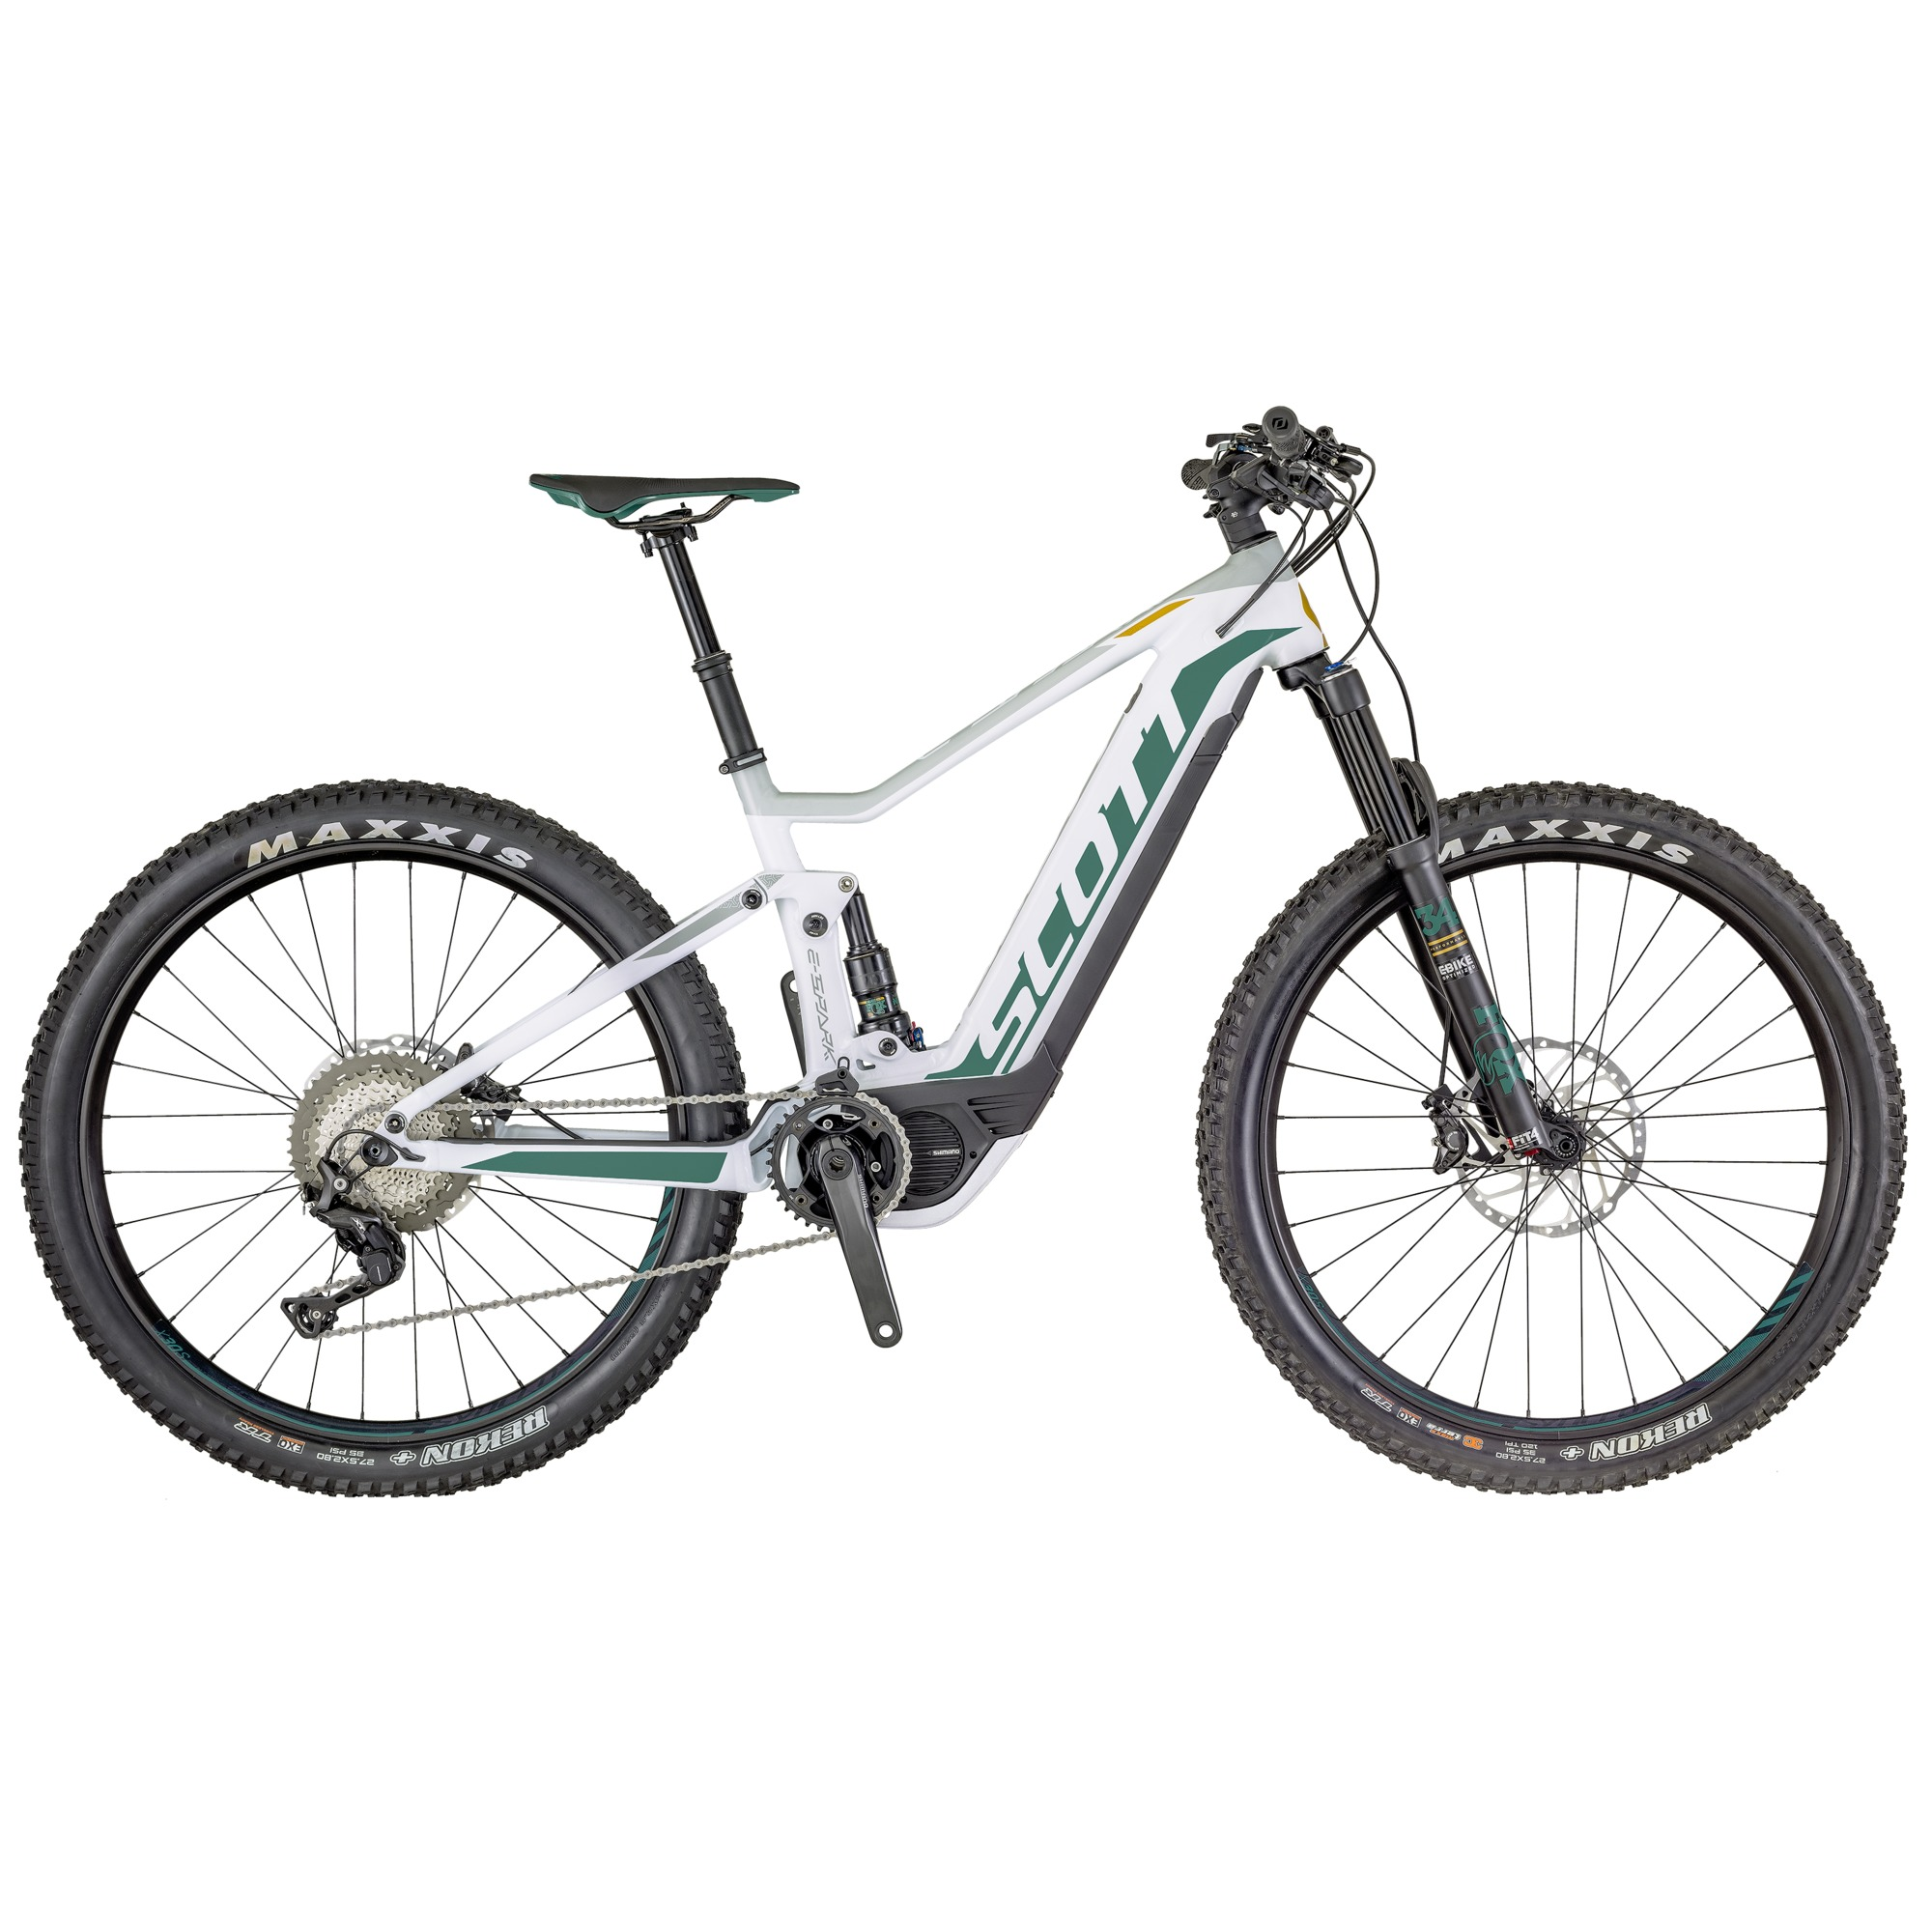 SCOTT E-Contessa Spark 710 Bike M - Zweirad Homann